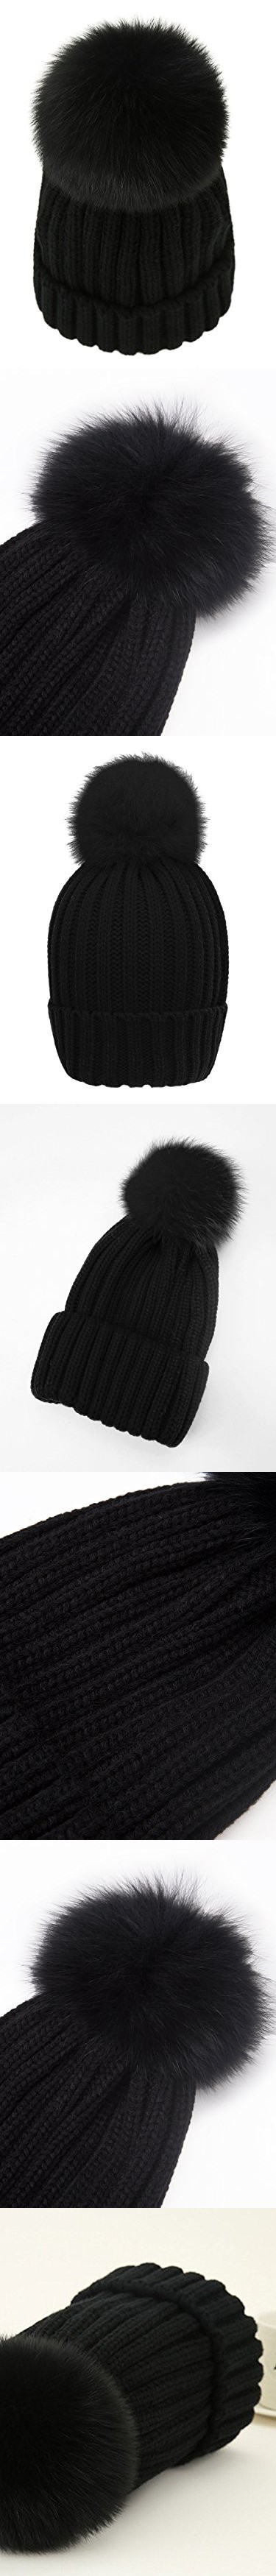 2a30f8c51ab LITHER Womens Girls Winter Fur Hat Real Large Fox Fur Pom Pom Beanie Winter  Hats Fur